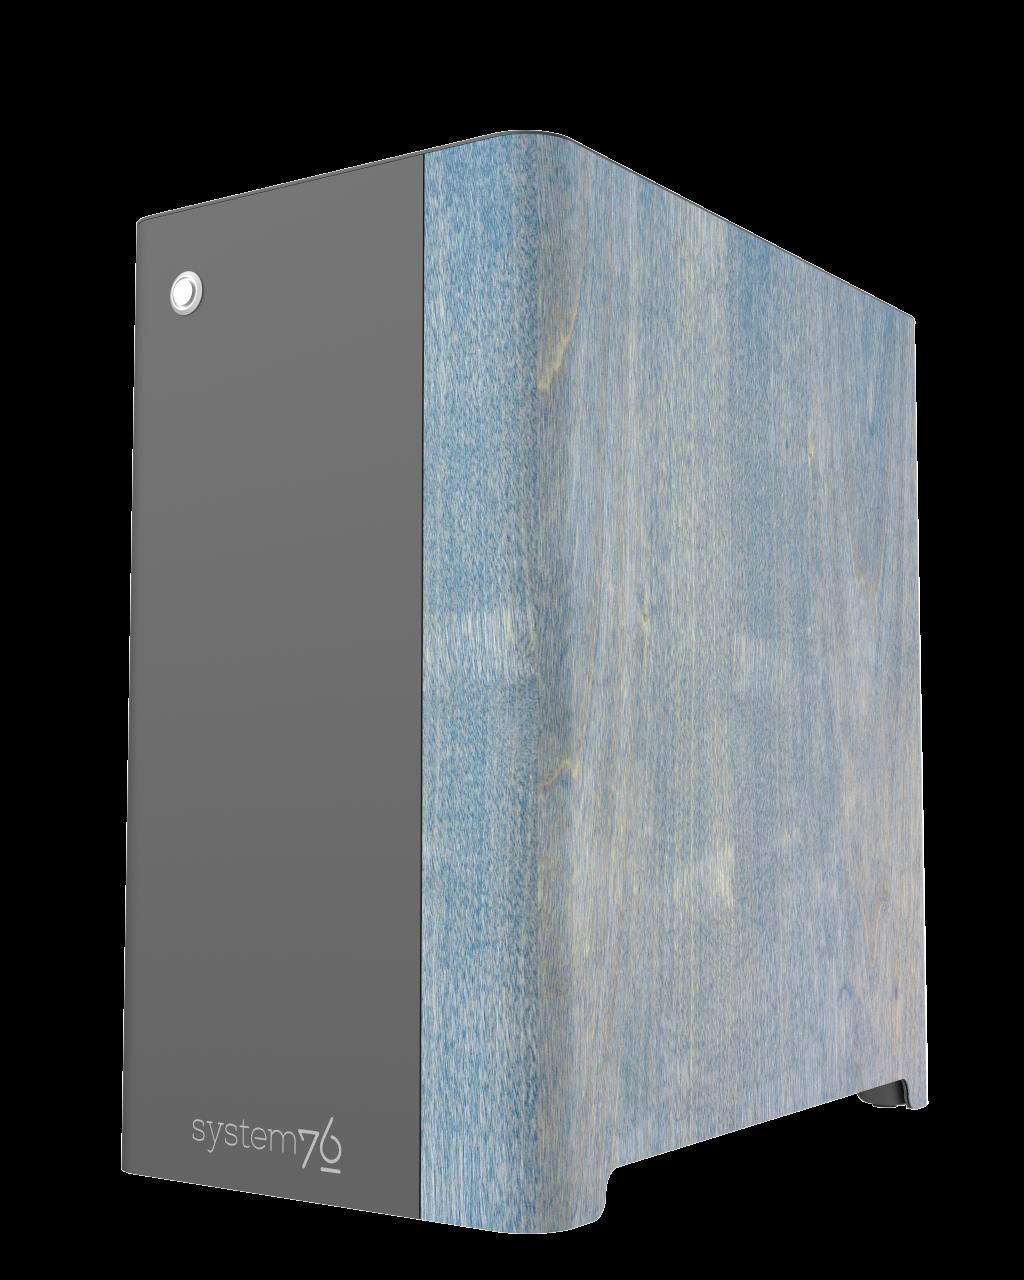 neptune-blue desktop